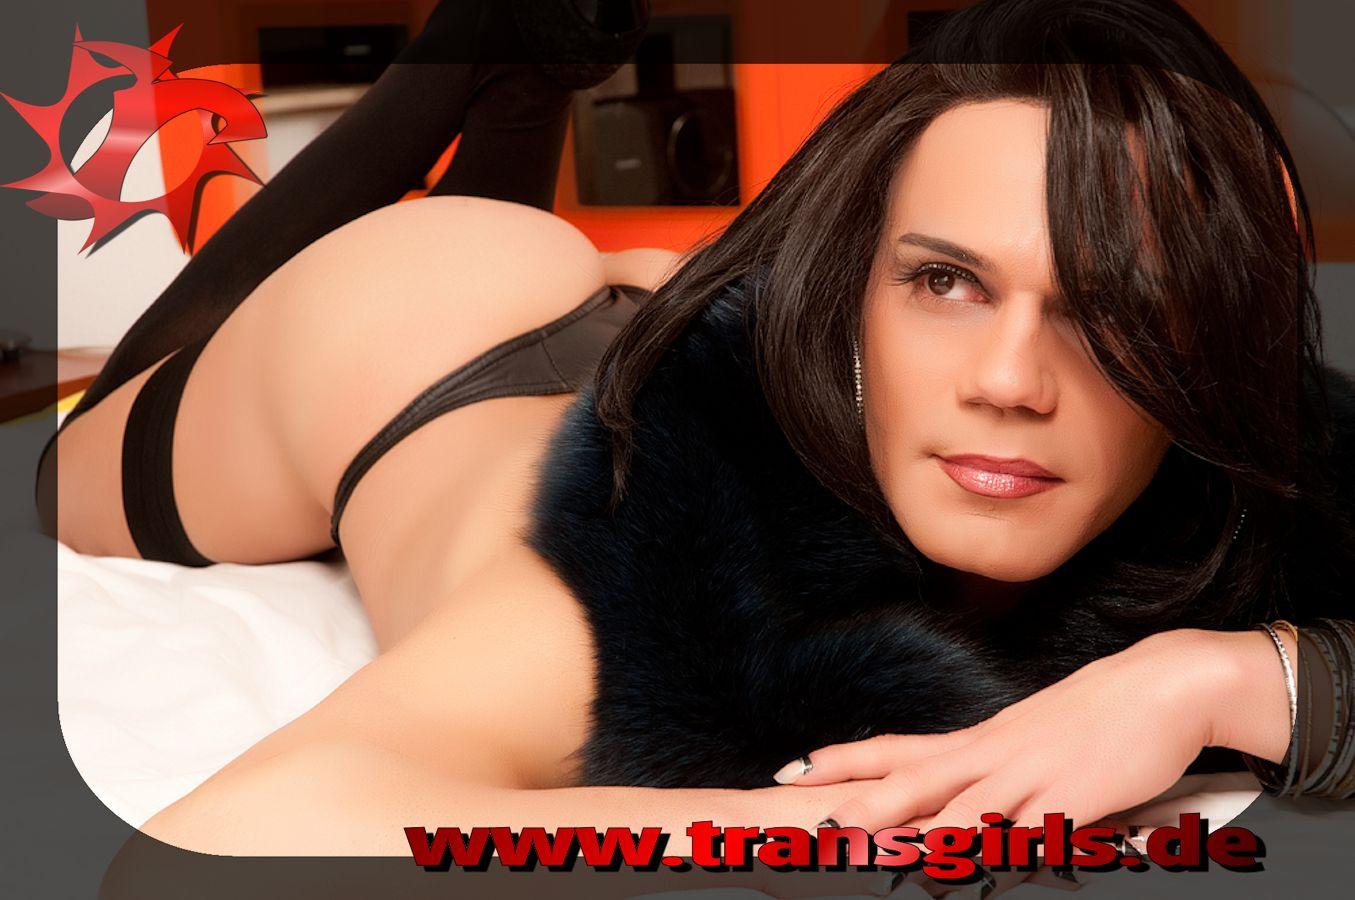 Foto Nr. 47636 von Shemale Trans Nikolly